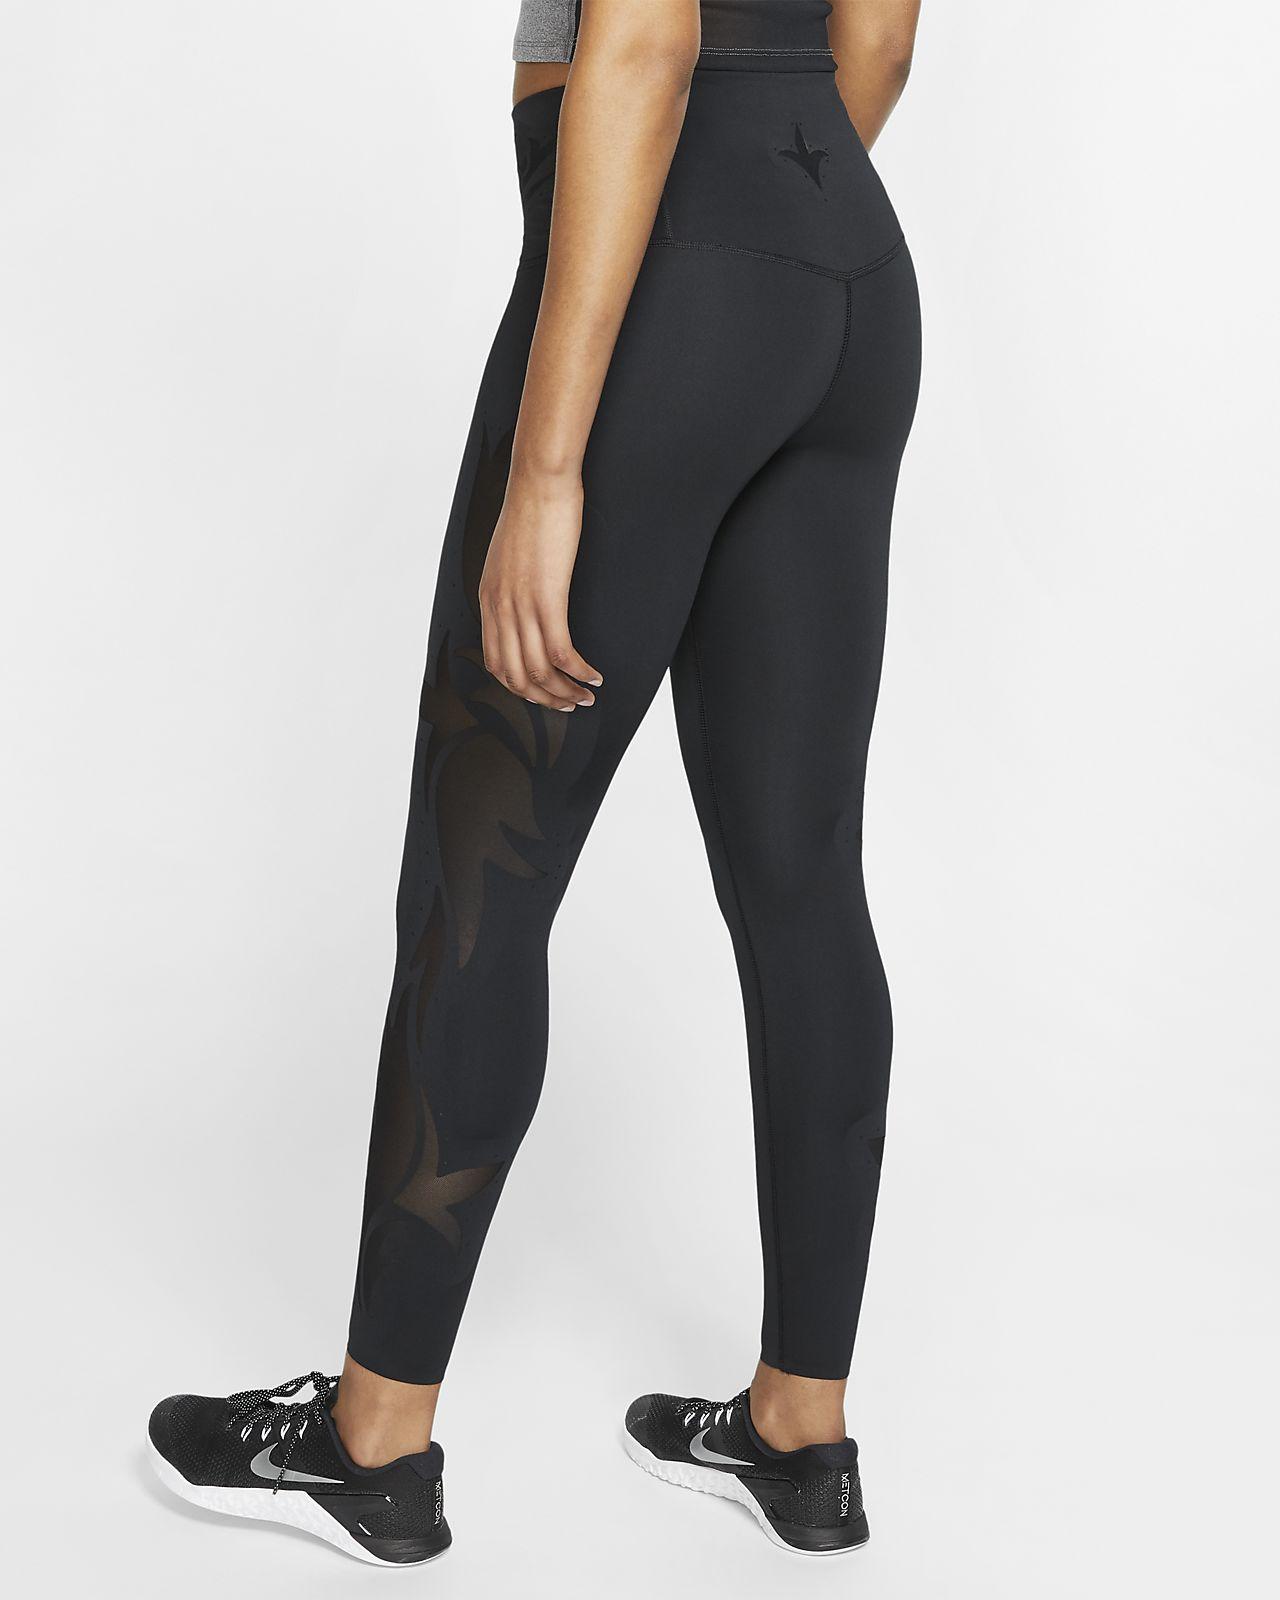 Nike Pro Warm Women's 78 Tights Cream | Products | Nike